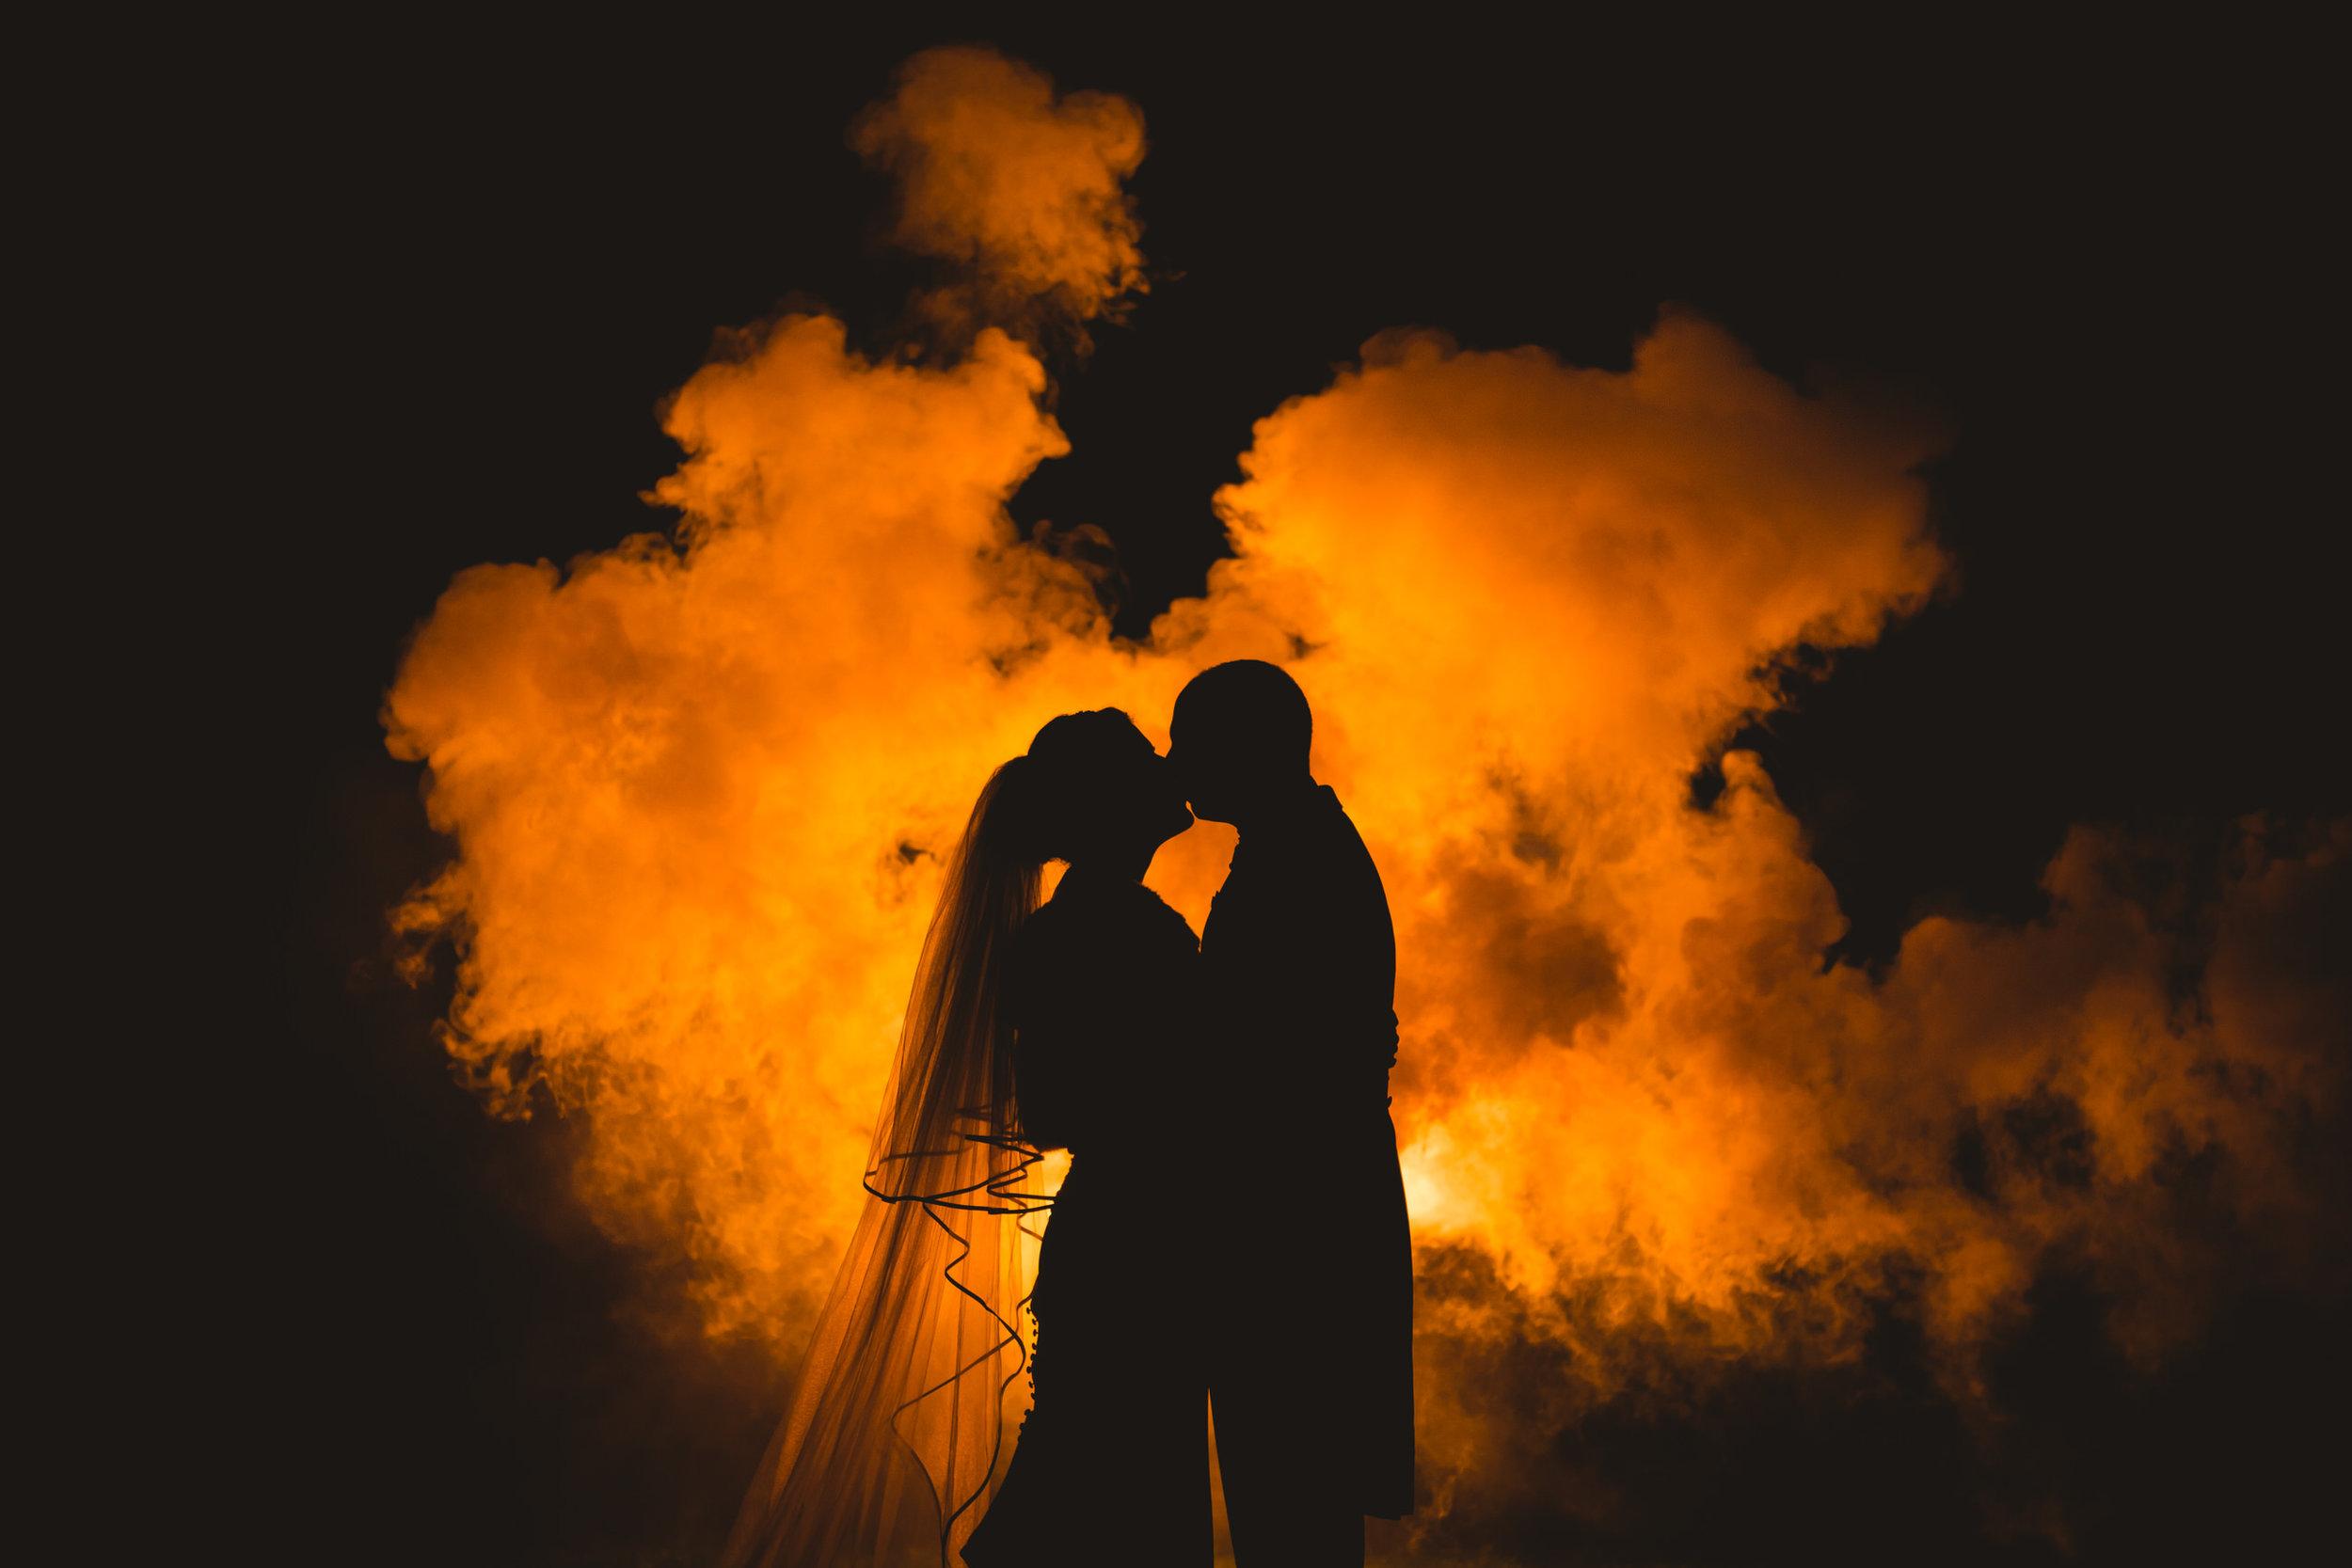 wharfedale-grange-harrogate-wedding-photographer-24.jpg